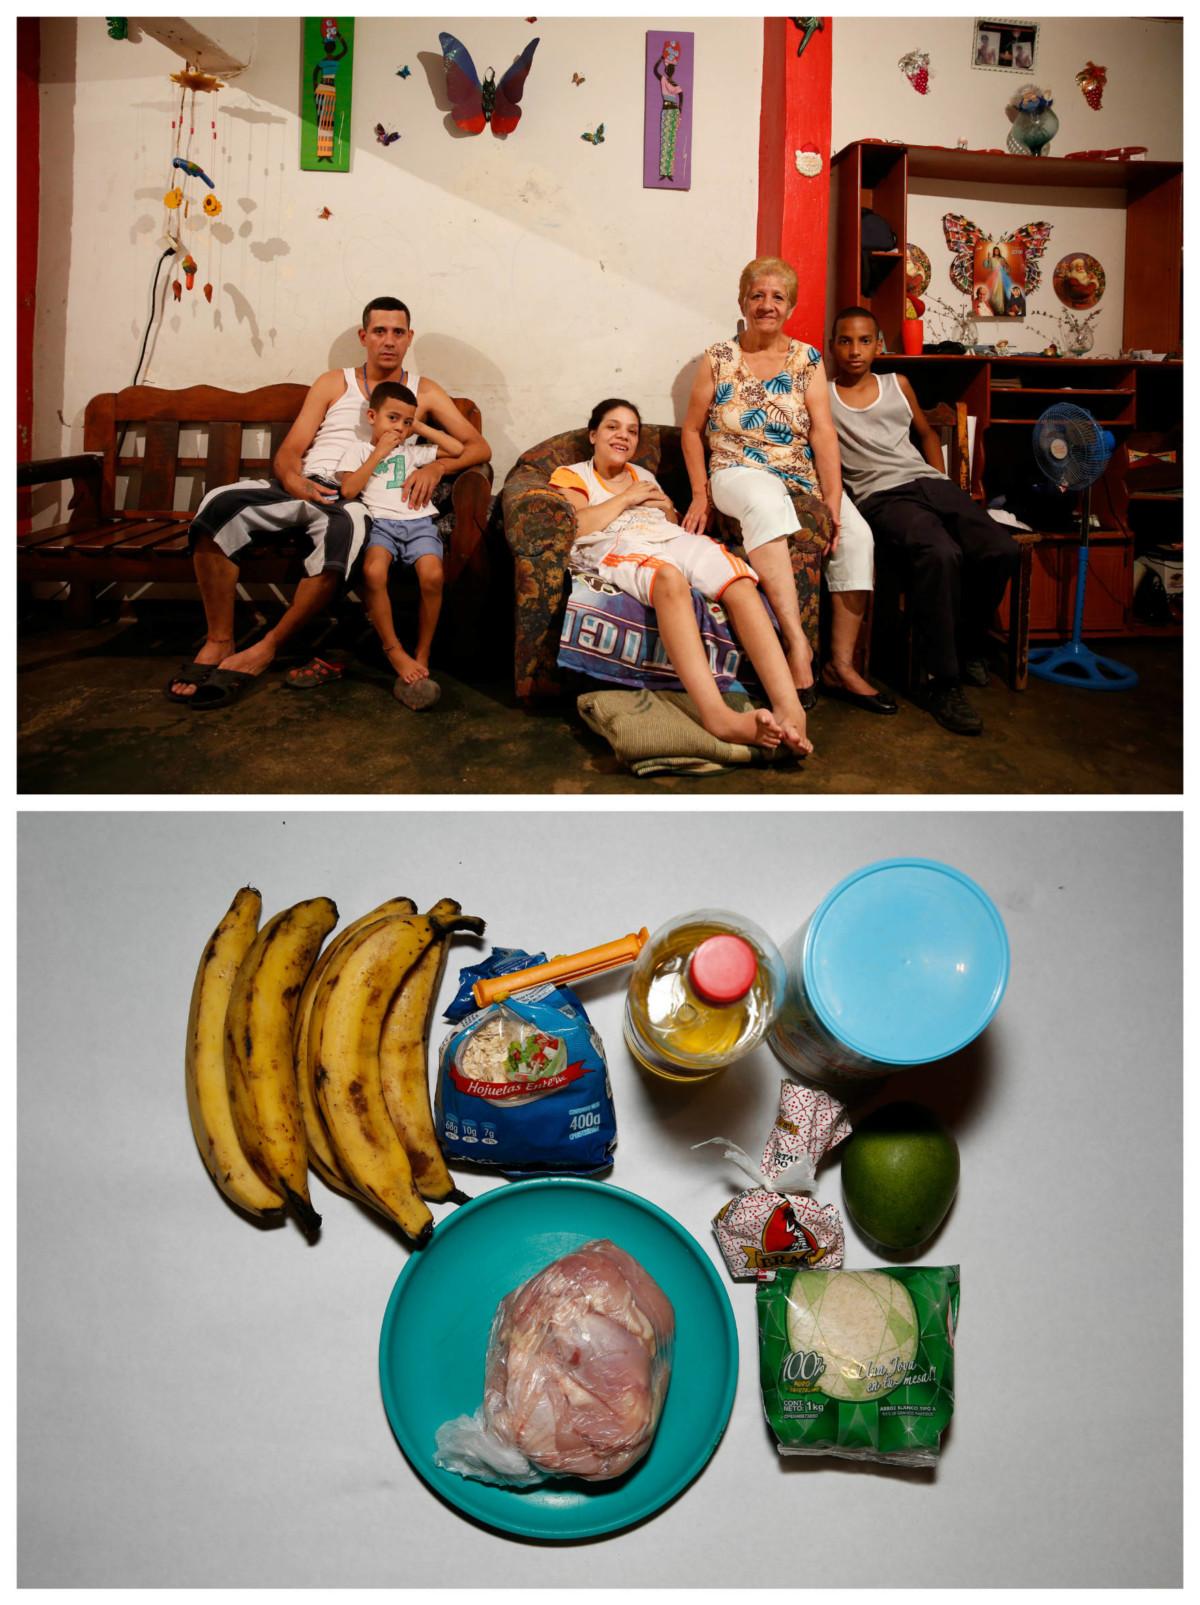 Alida Gonzalez 與親戚:「以前買到早午晚三餐的錢,現在只能買到早餐,而且是不算好的早餐。」